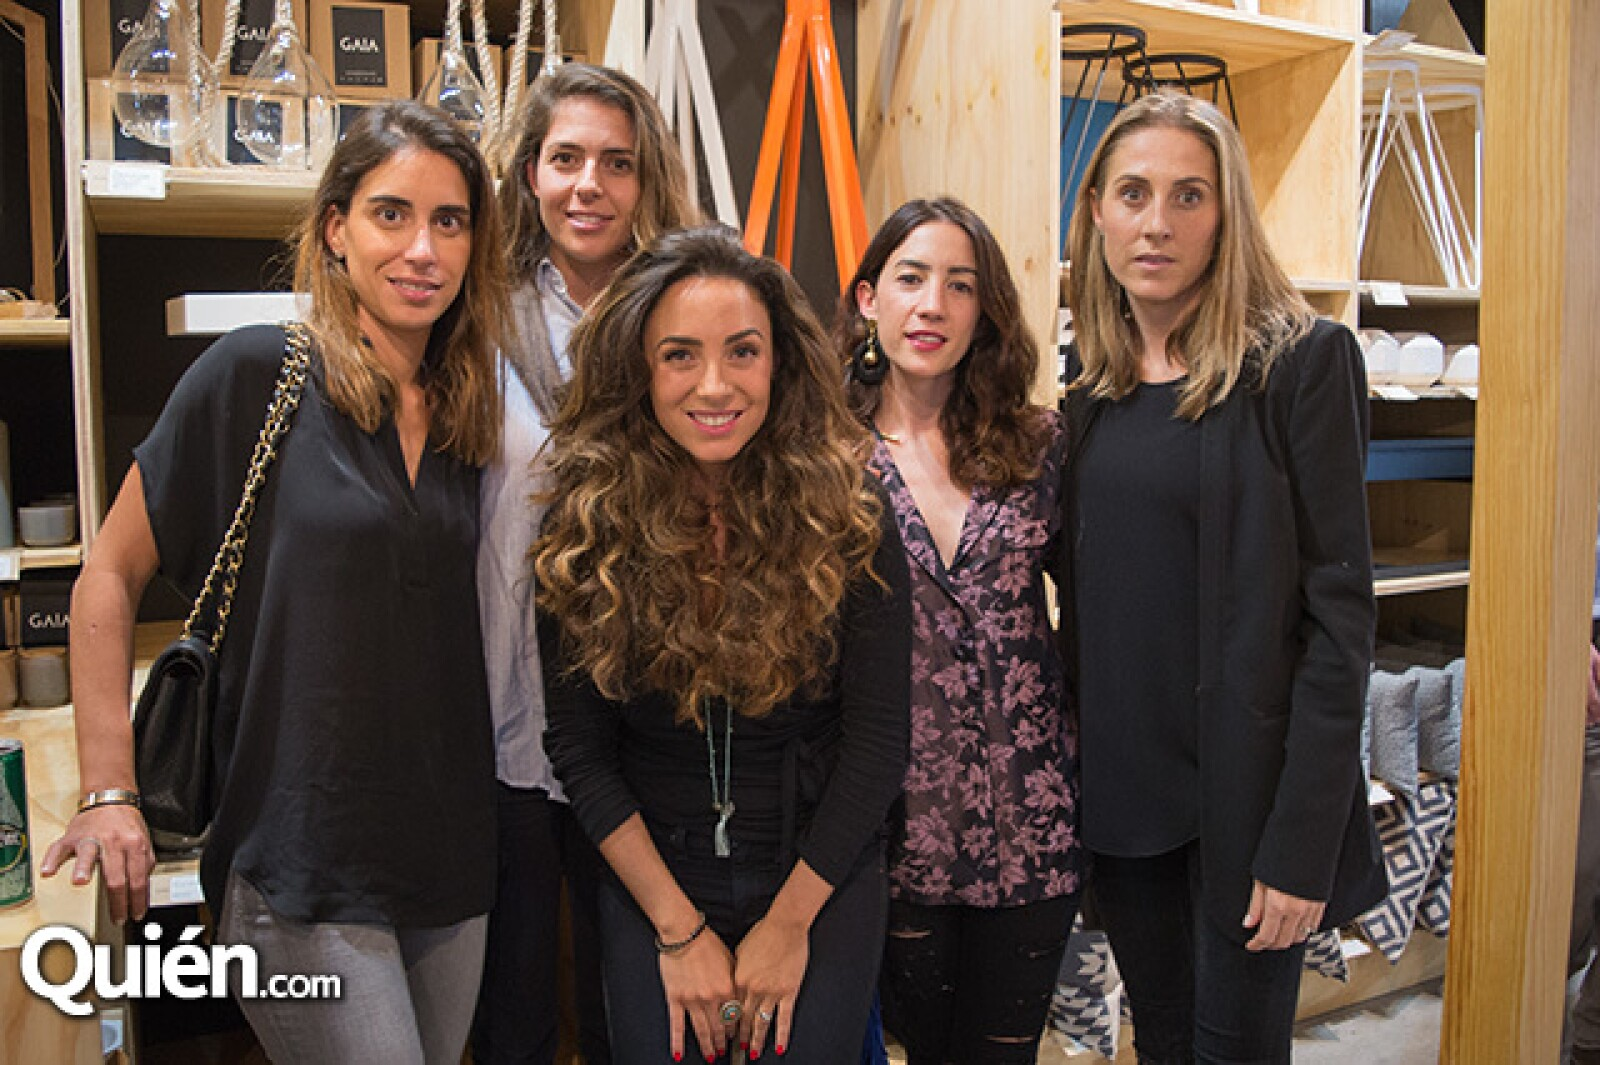 Carla Braun, Mariana González, Marion Cortina, Maréa Tellez y Susana Reyes Retana